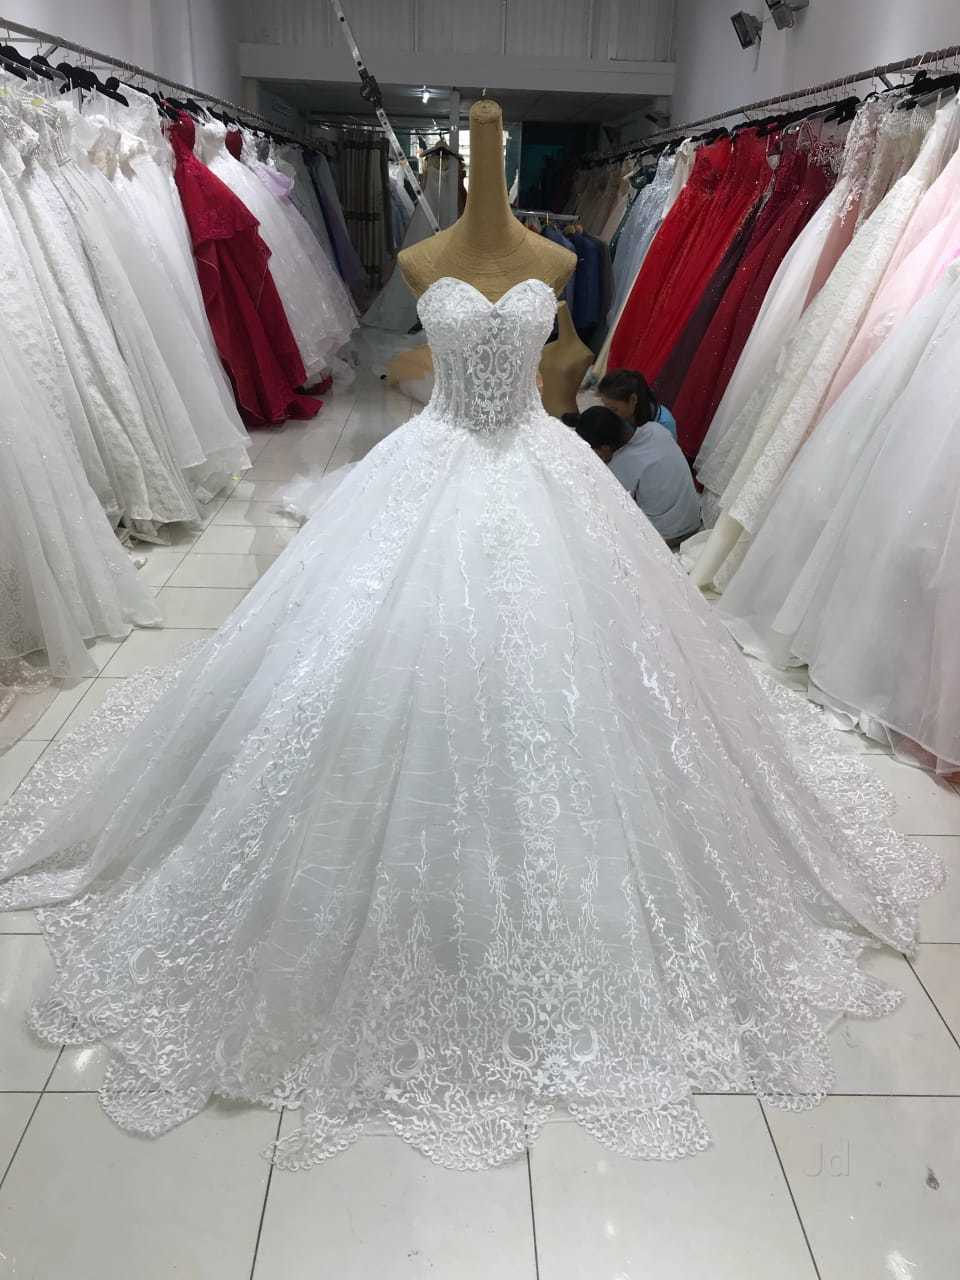 3bf842dfa09 White Wedding Gowns Shops In Mumbai - Gomes Weine AG